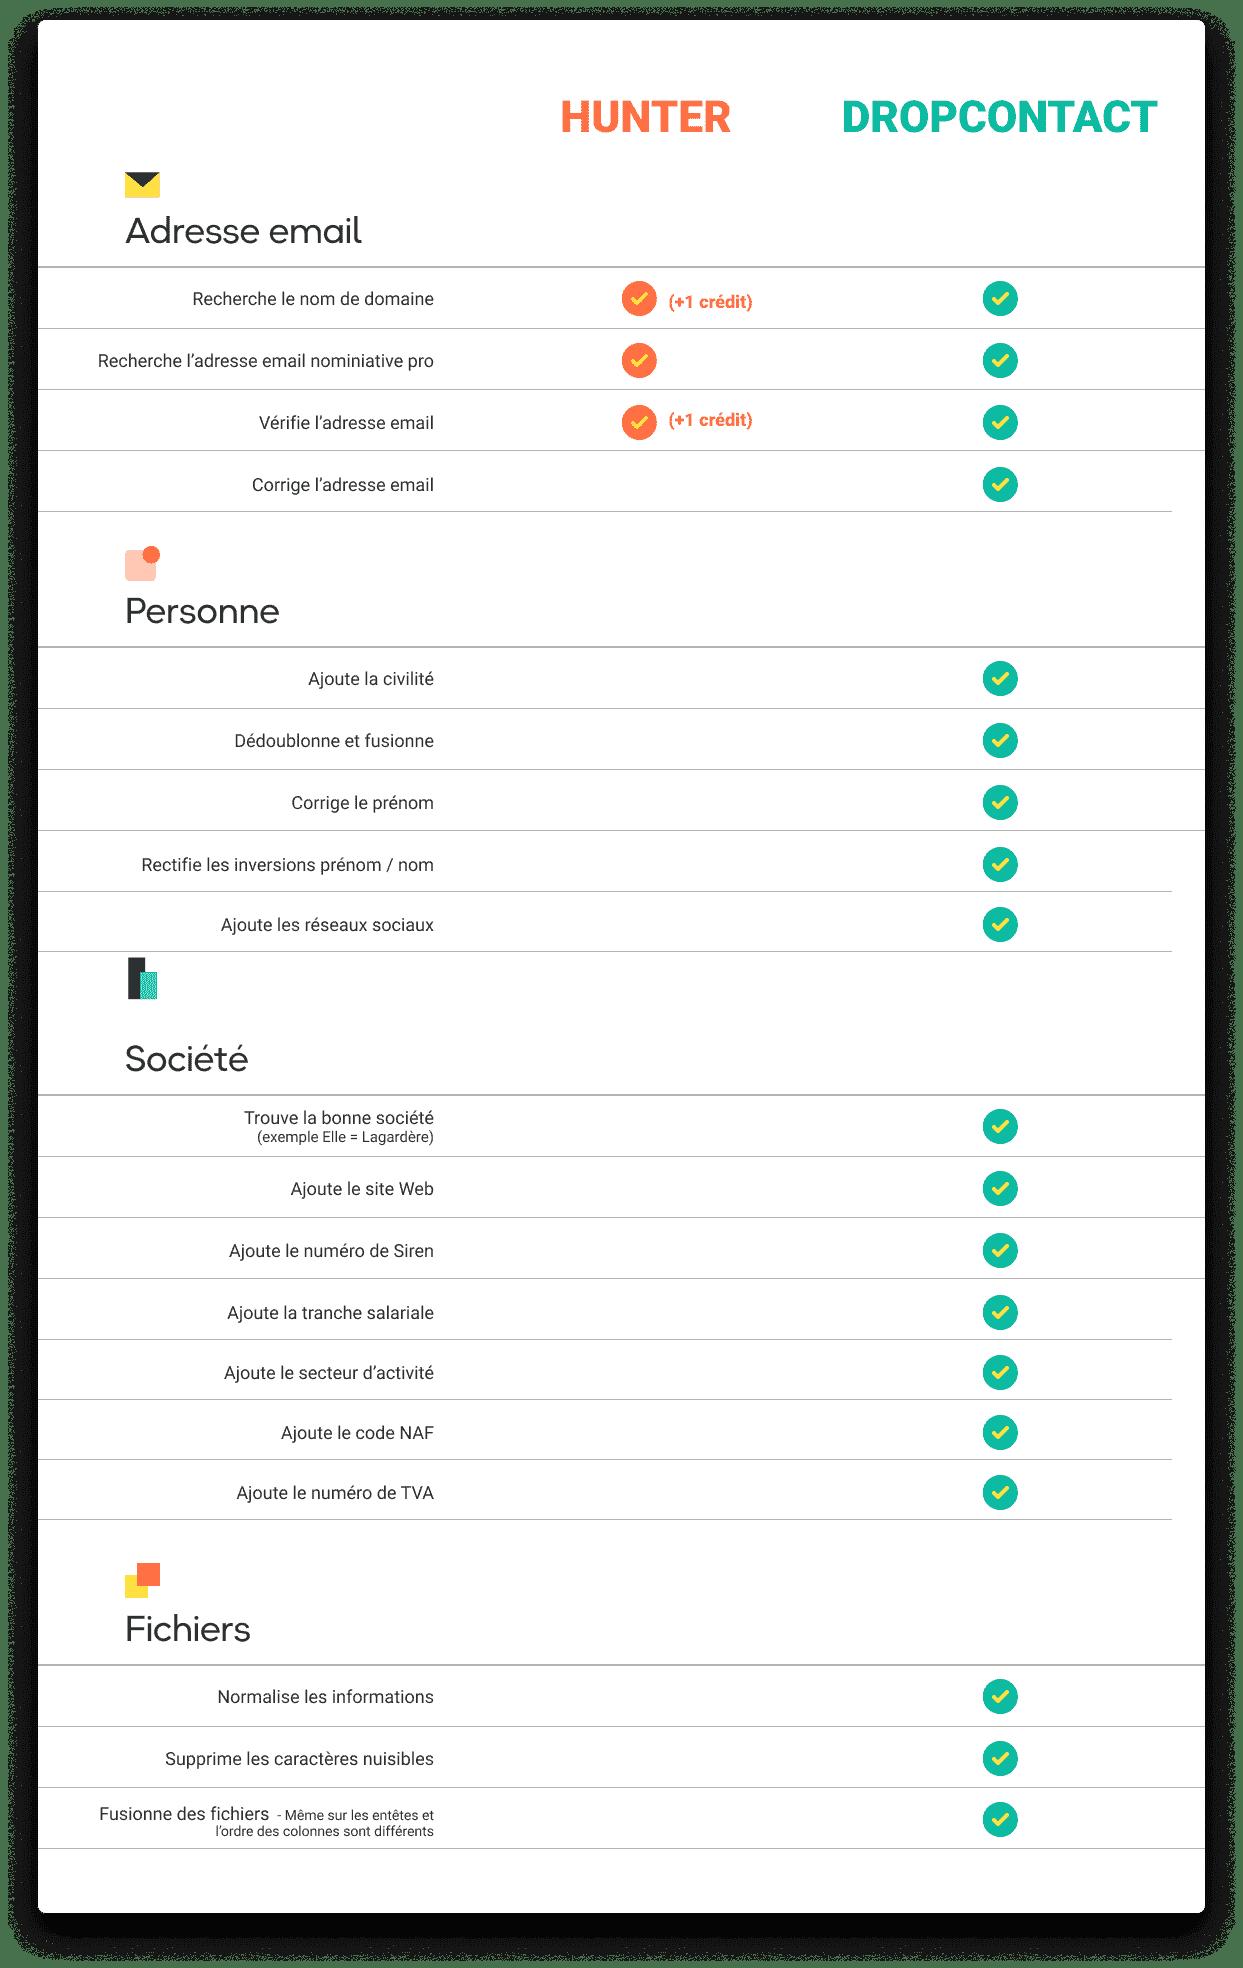 comparatif email hunter.io  - Dropcontact